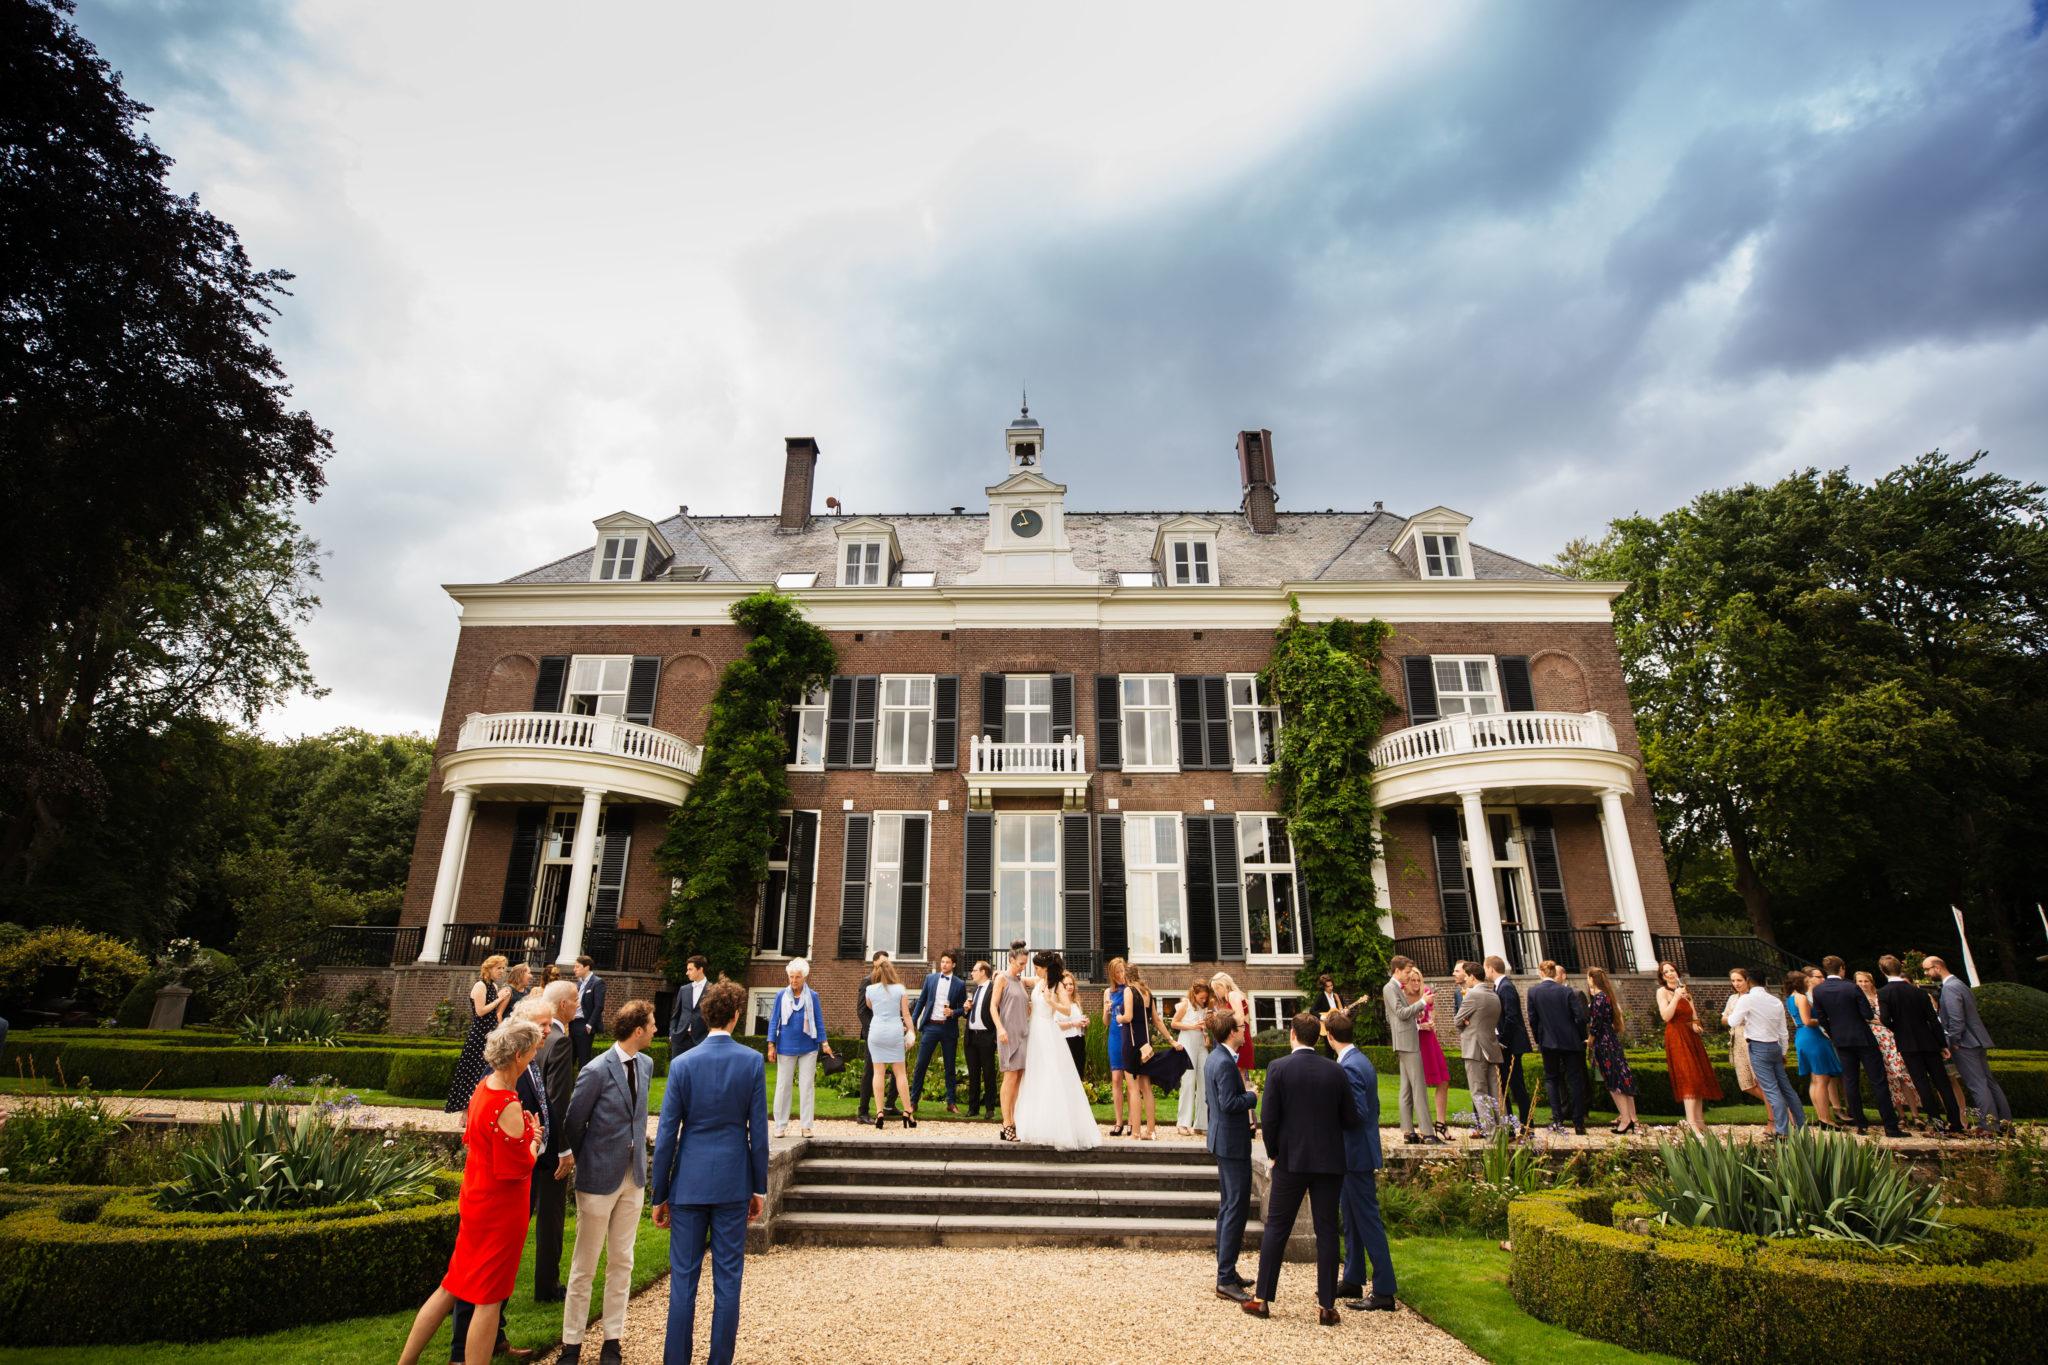 Bruiloft Borrel Landgoed Rhederoord